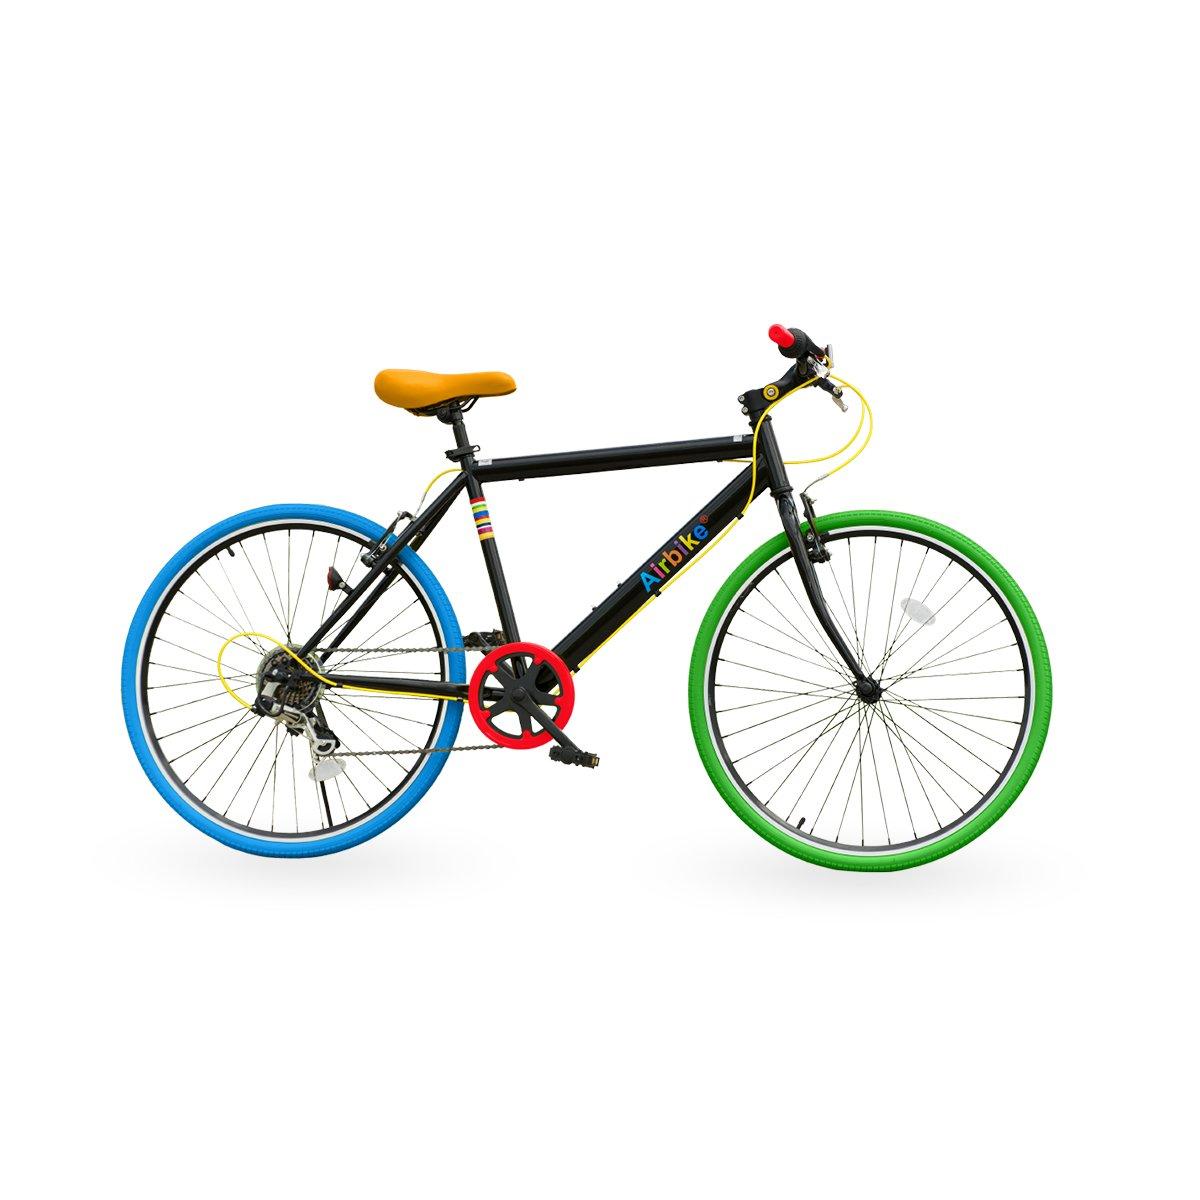 Airbike クロスバイク 自転車 26インチタイヤ シマノ7段変速 B01JING3V4 ブラック×ポップ ブラック×ポップ